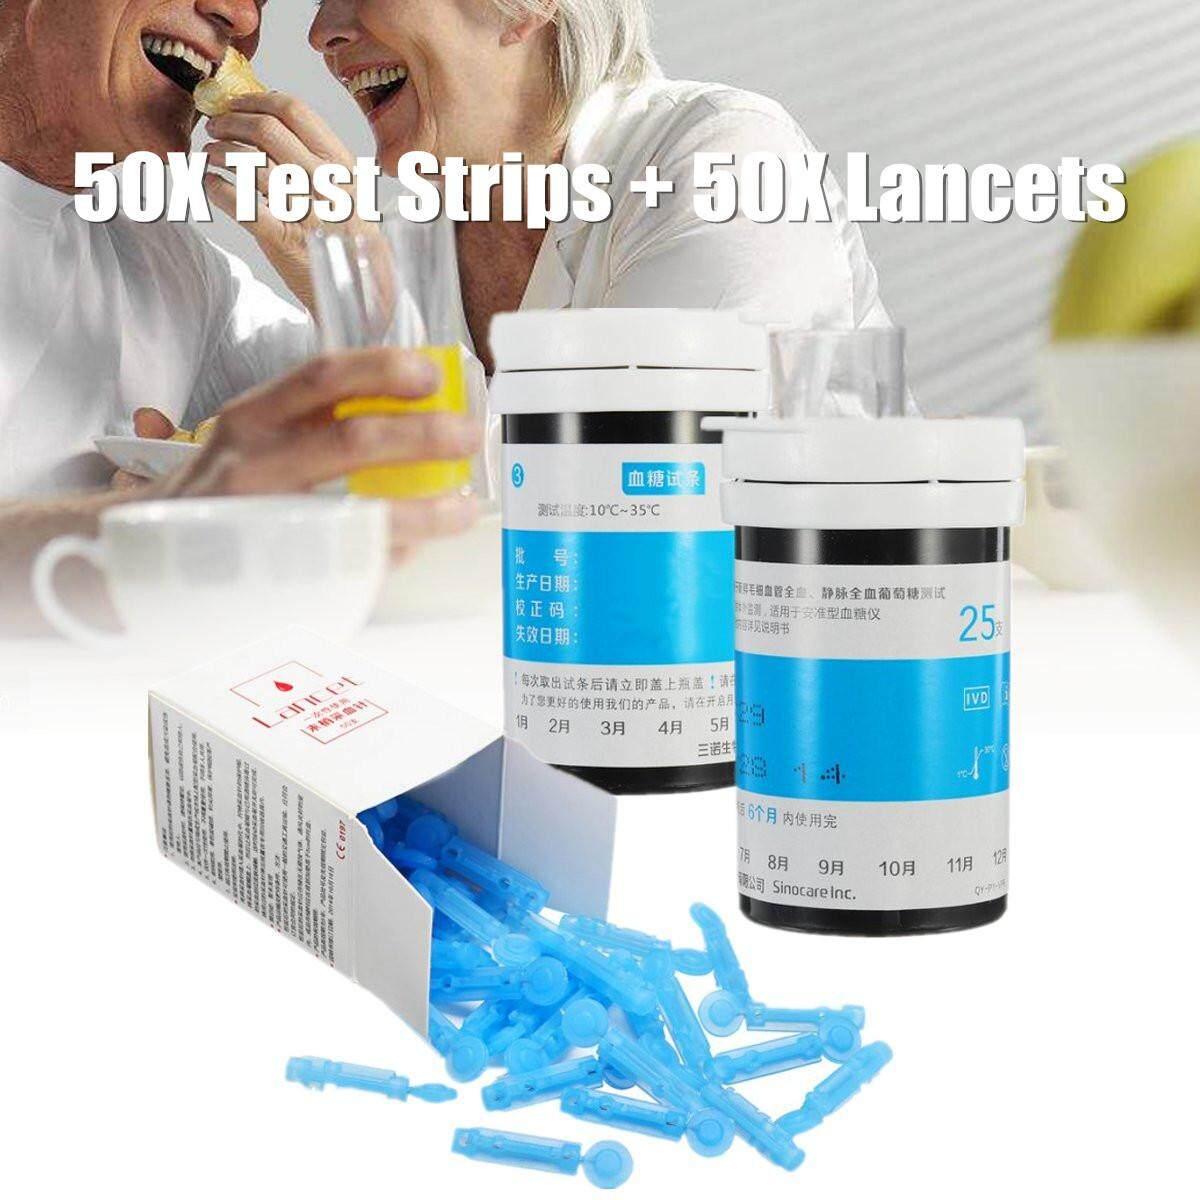 50Pcs Sannuo Blood Glucose Meter Glucometer Test Strips Lancets Health Monitors